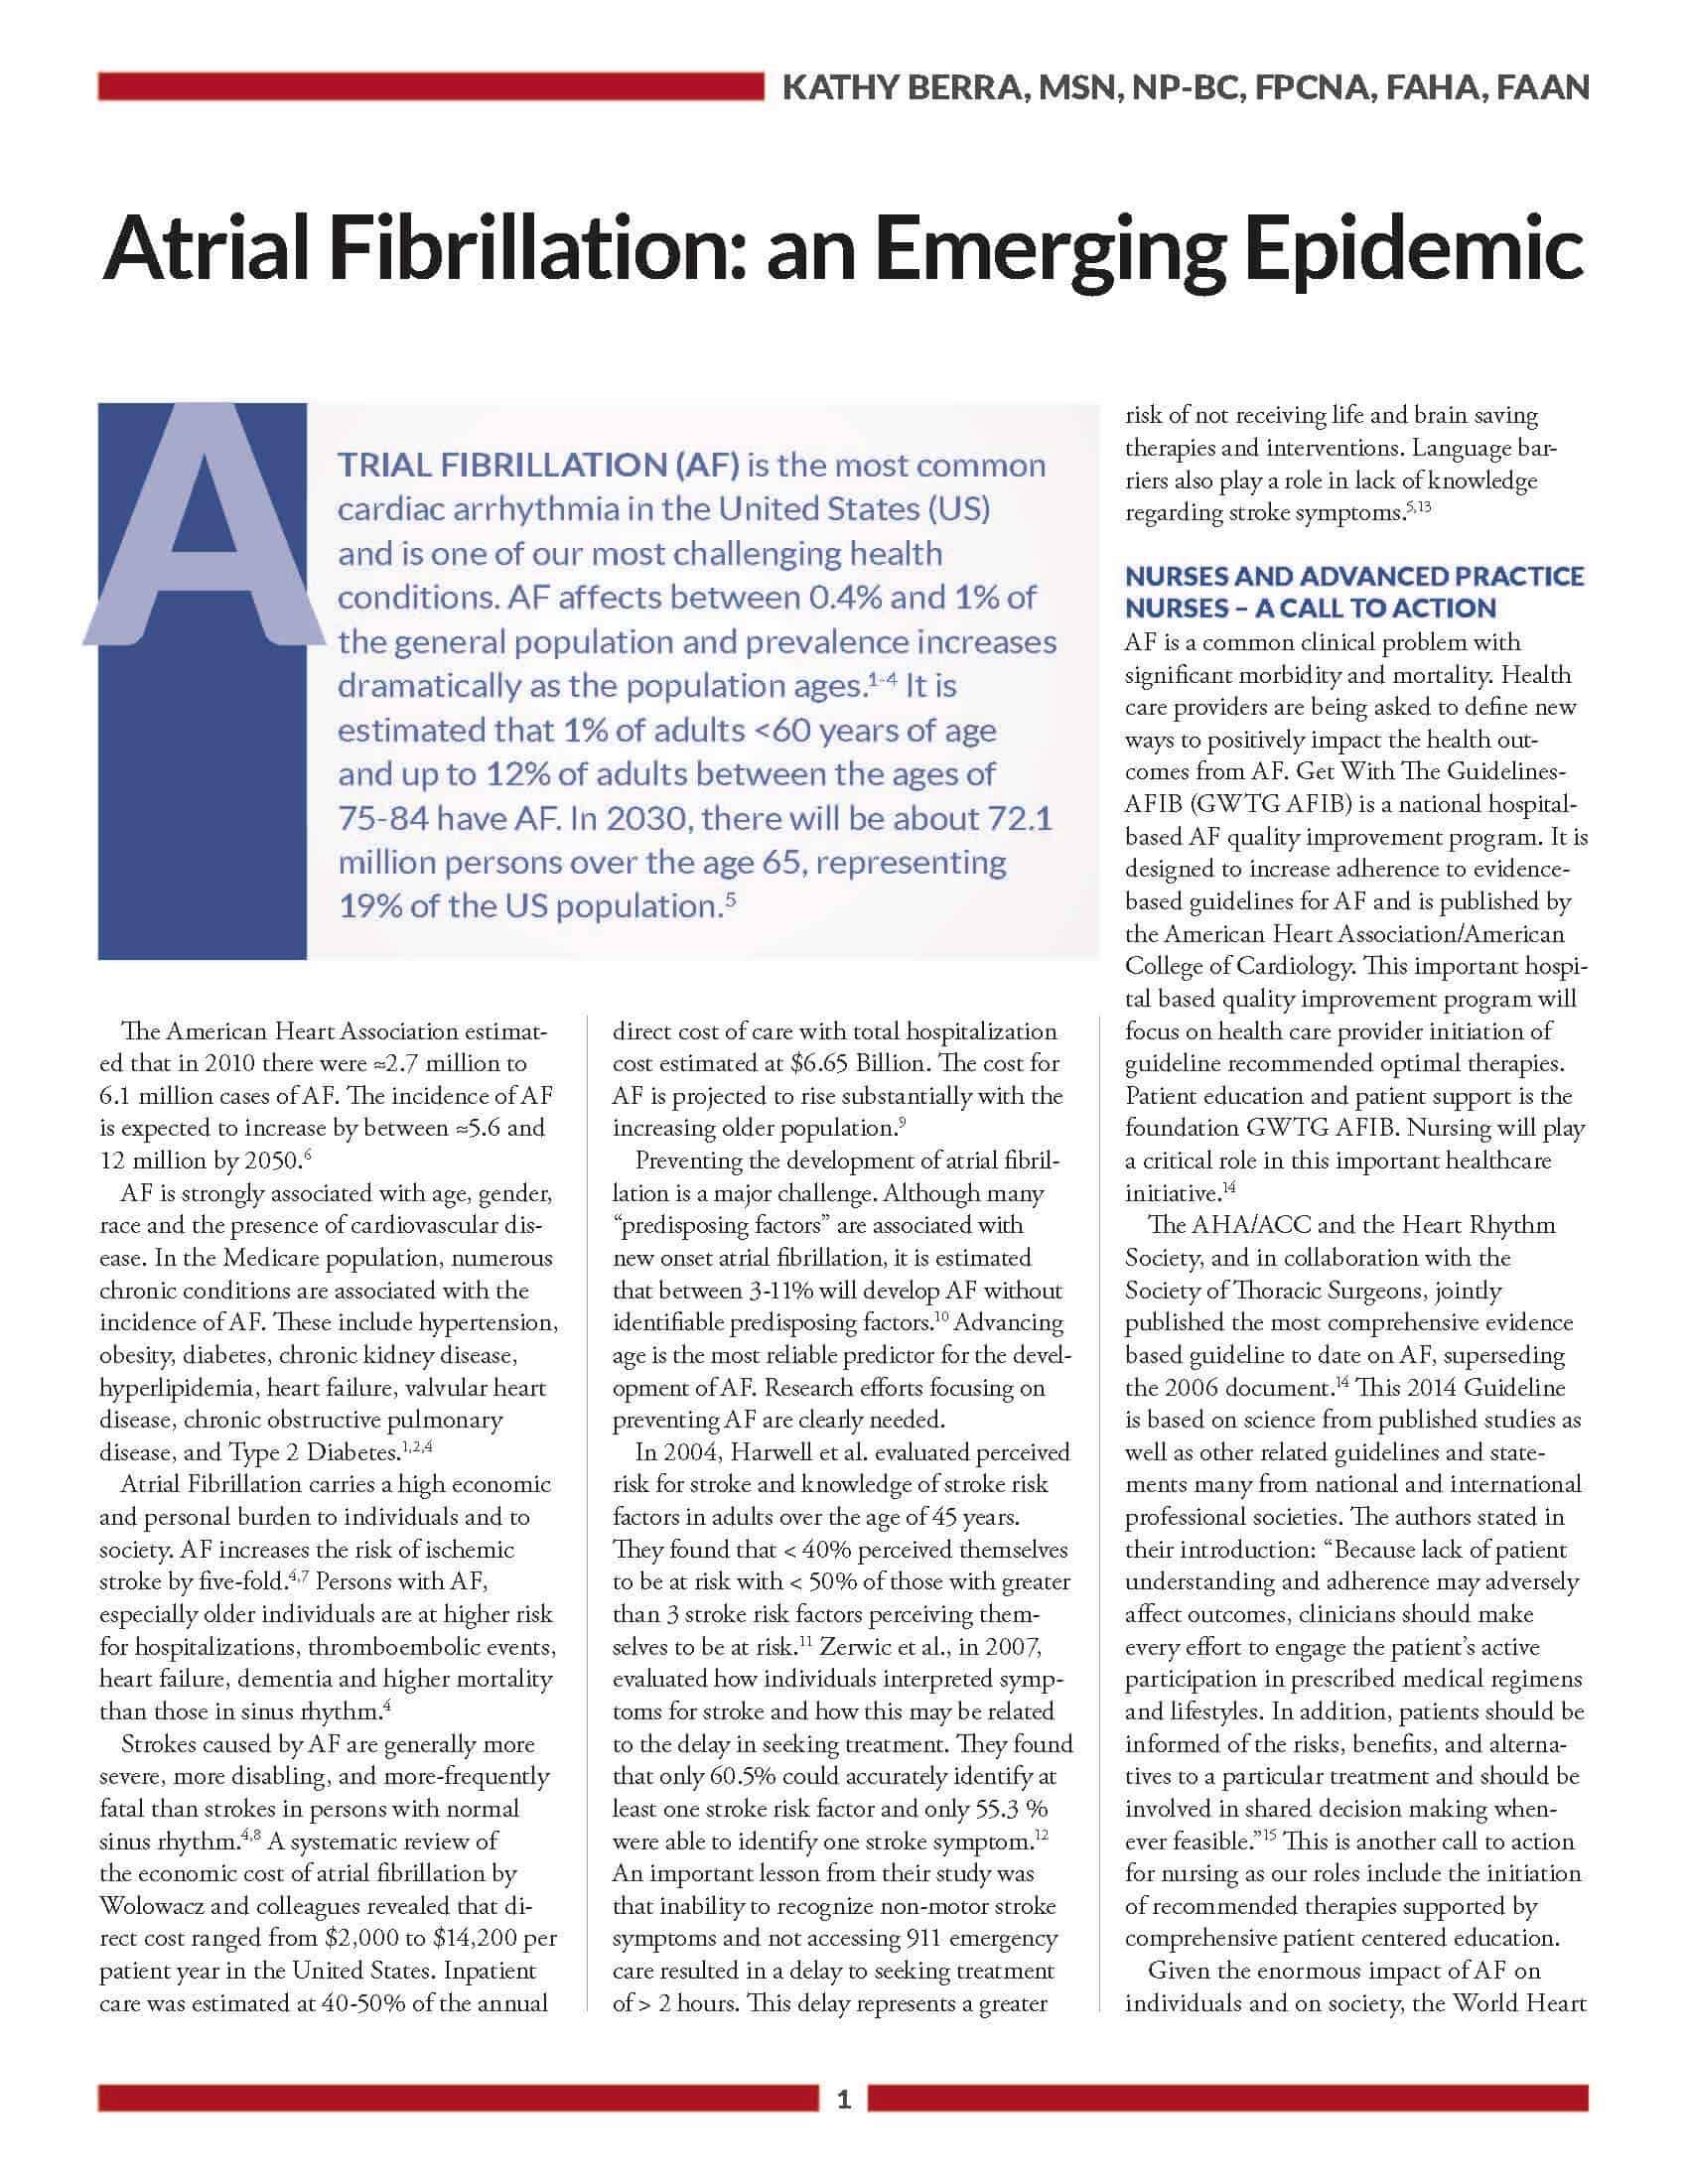 afib-supplement_emerging-epidemic